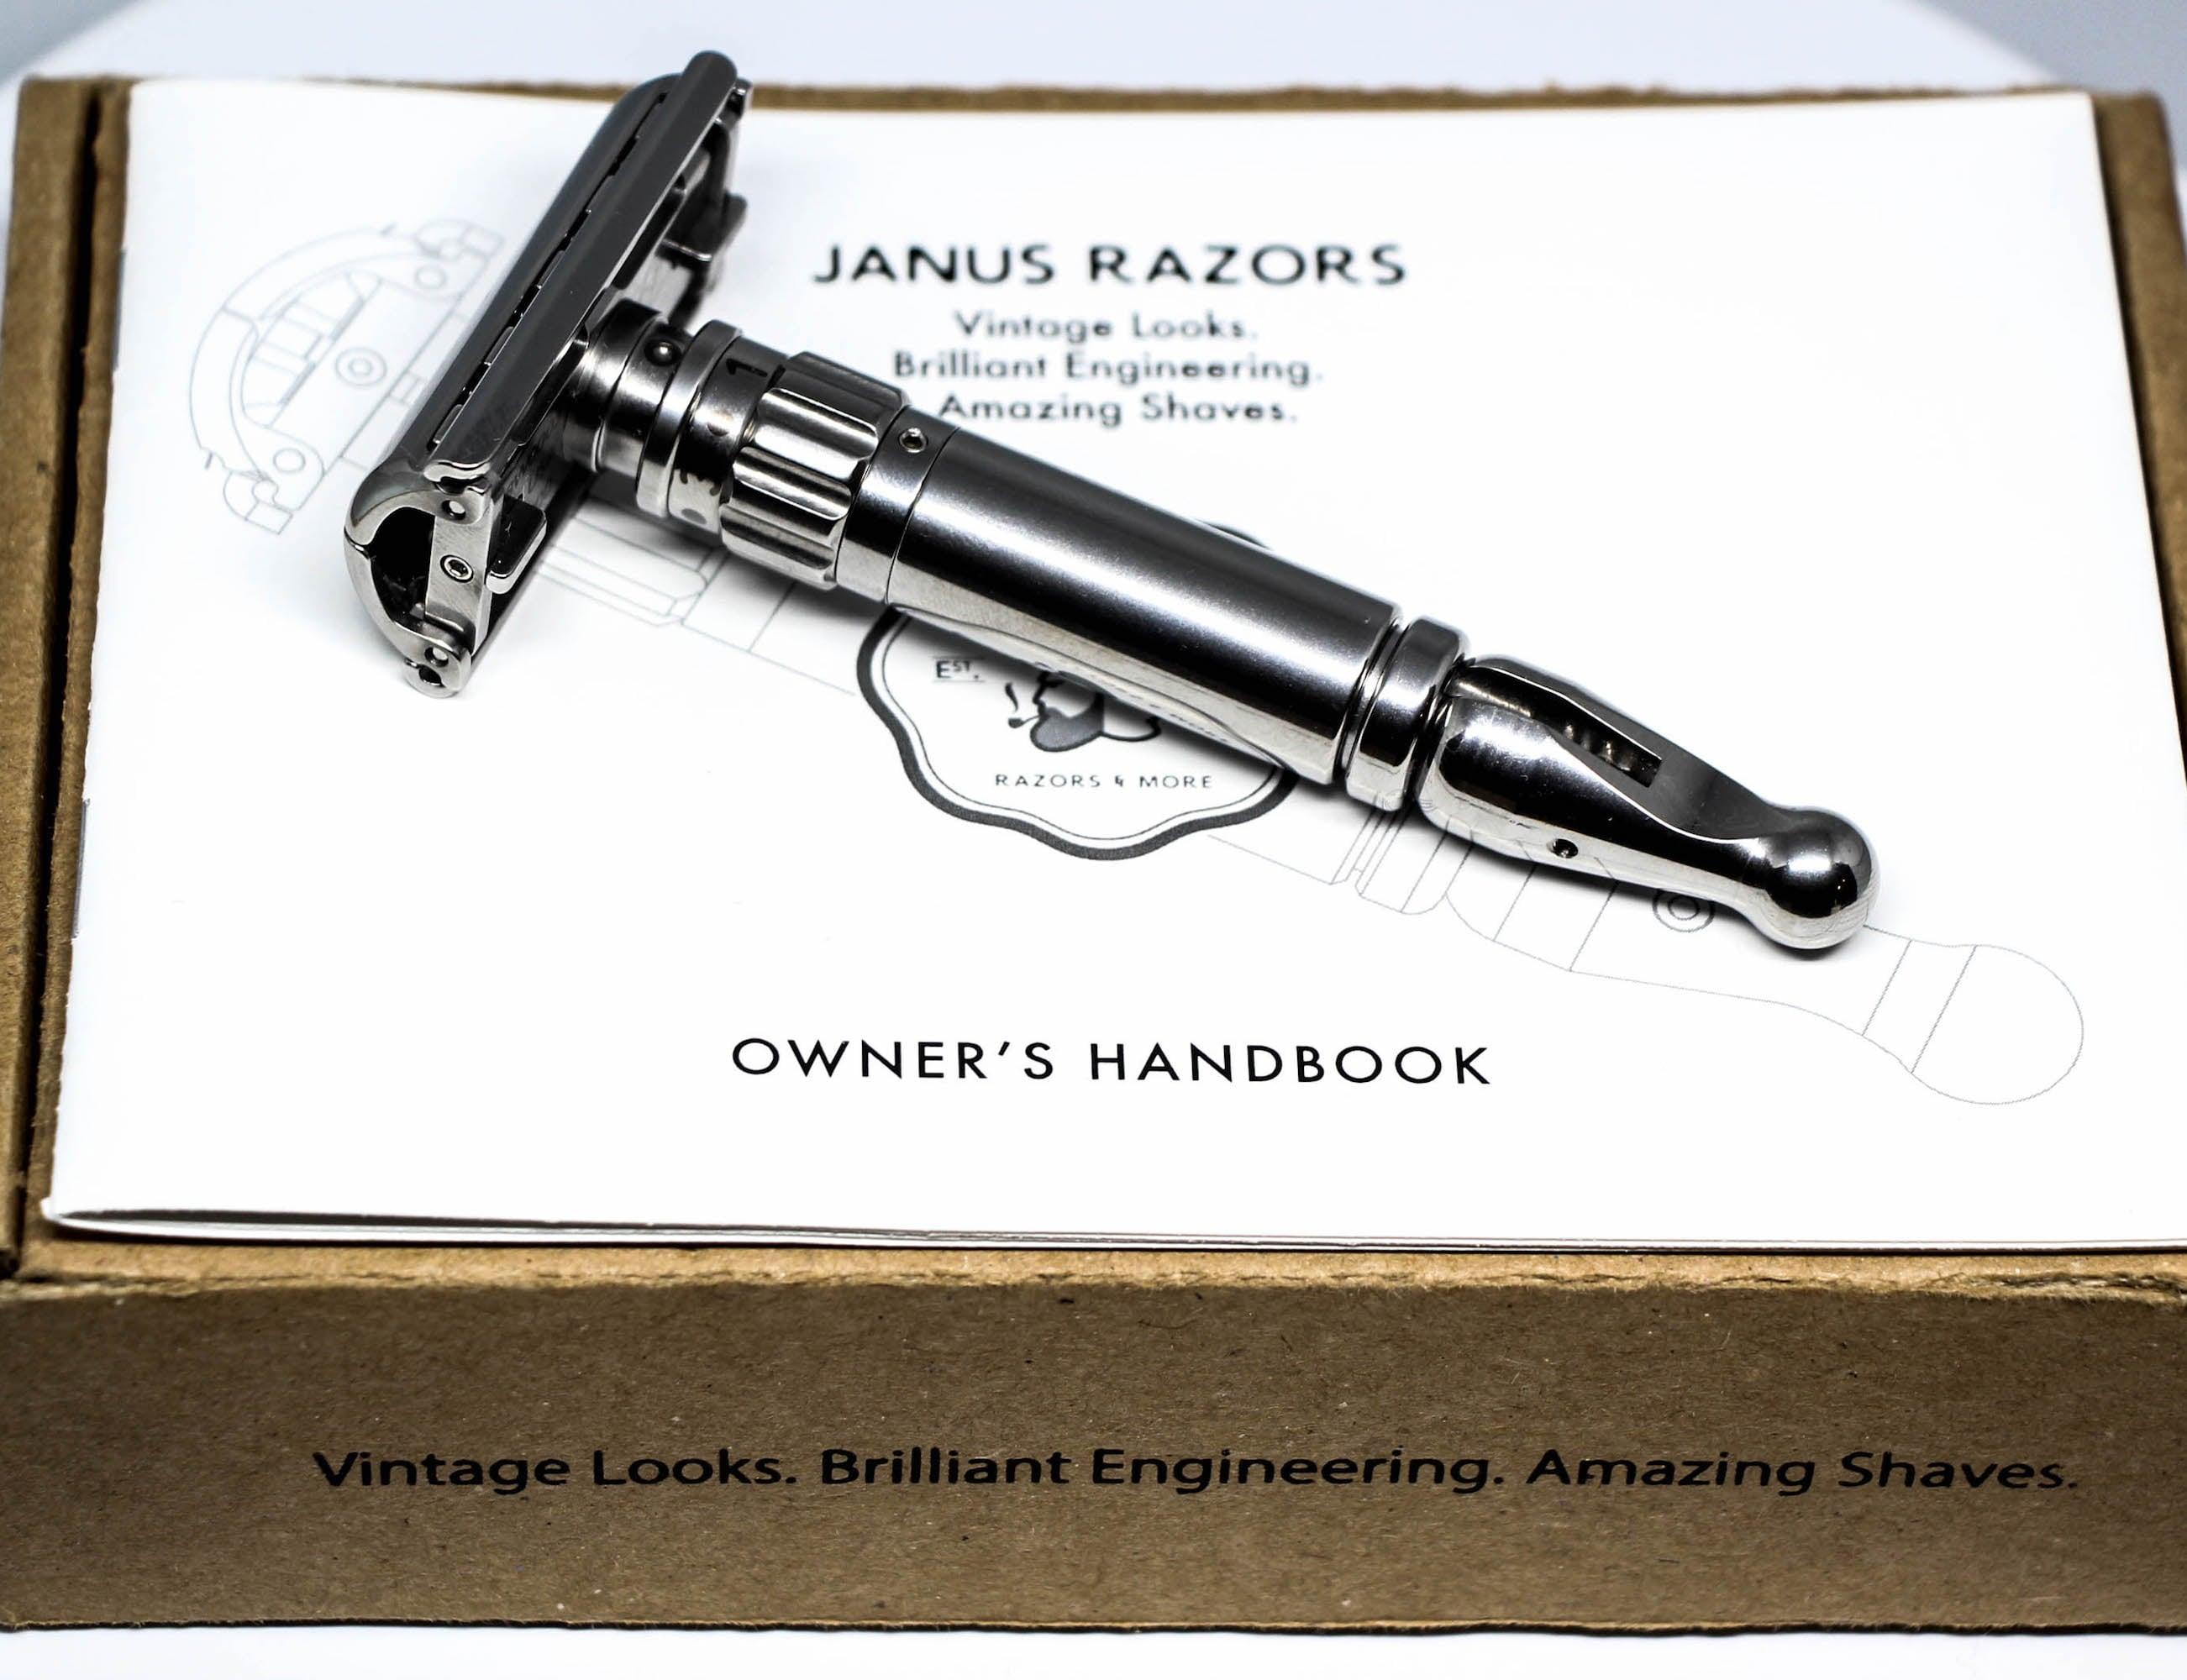 Janus Razor Modern Adjustable Safety Razor lets you customize your shave